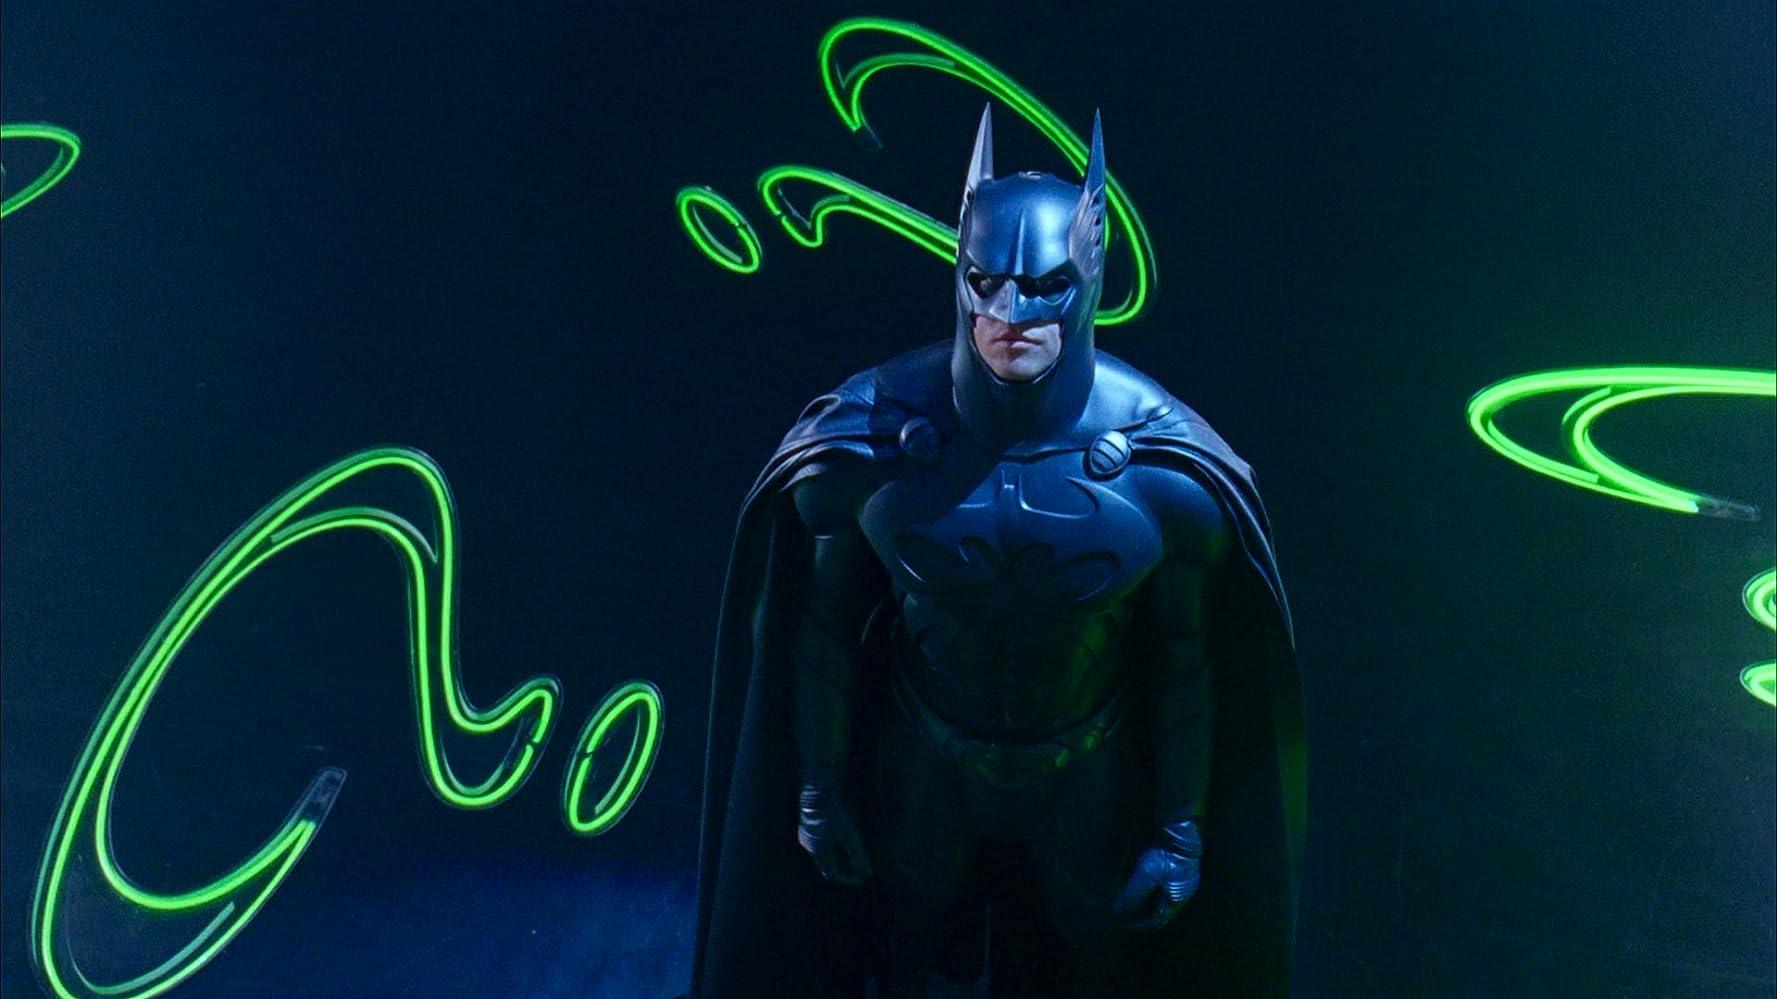 Val Kilmer in Batman Forever (1995)